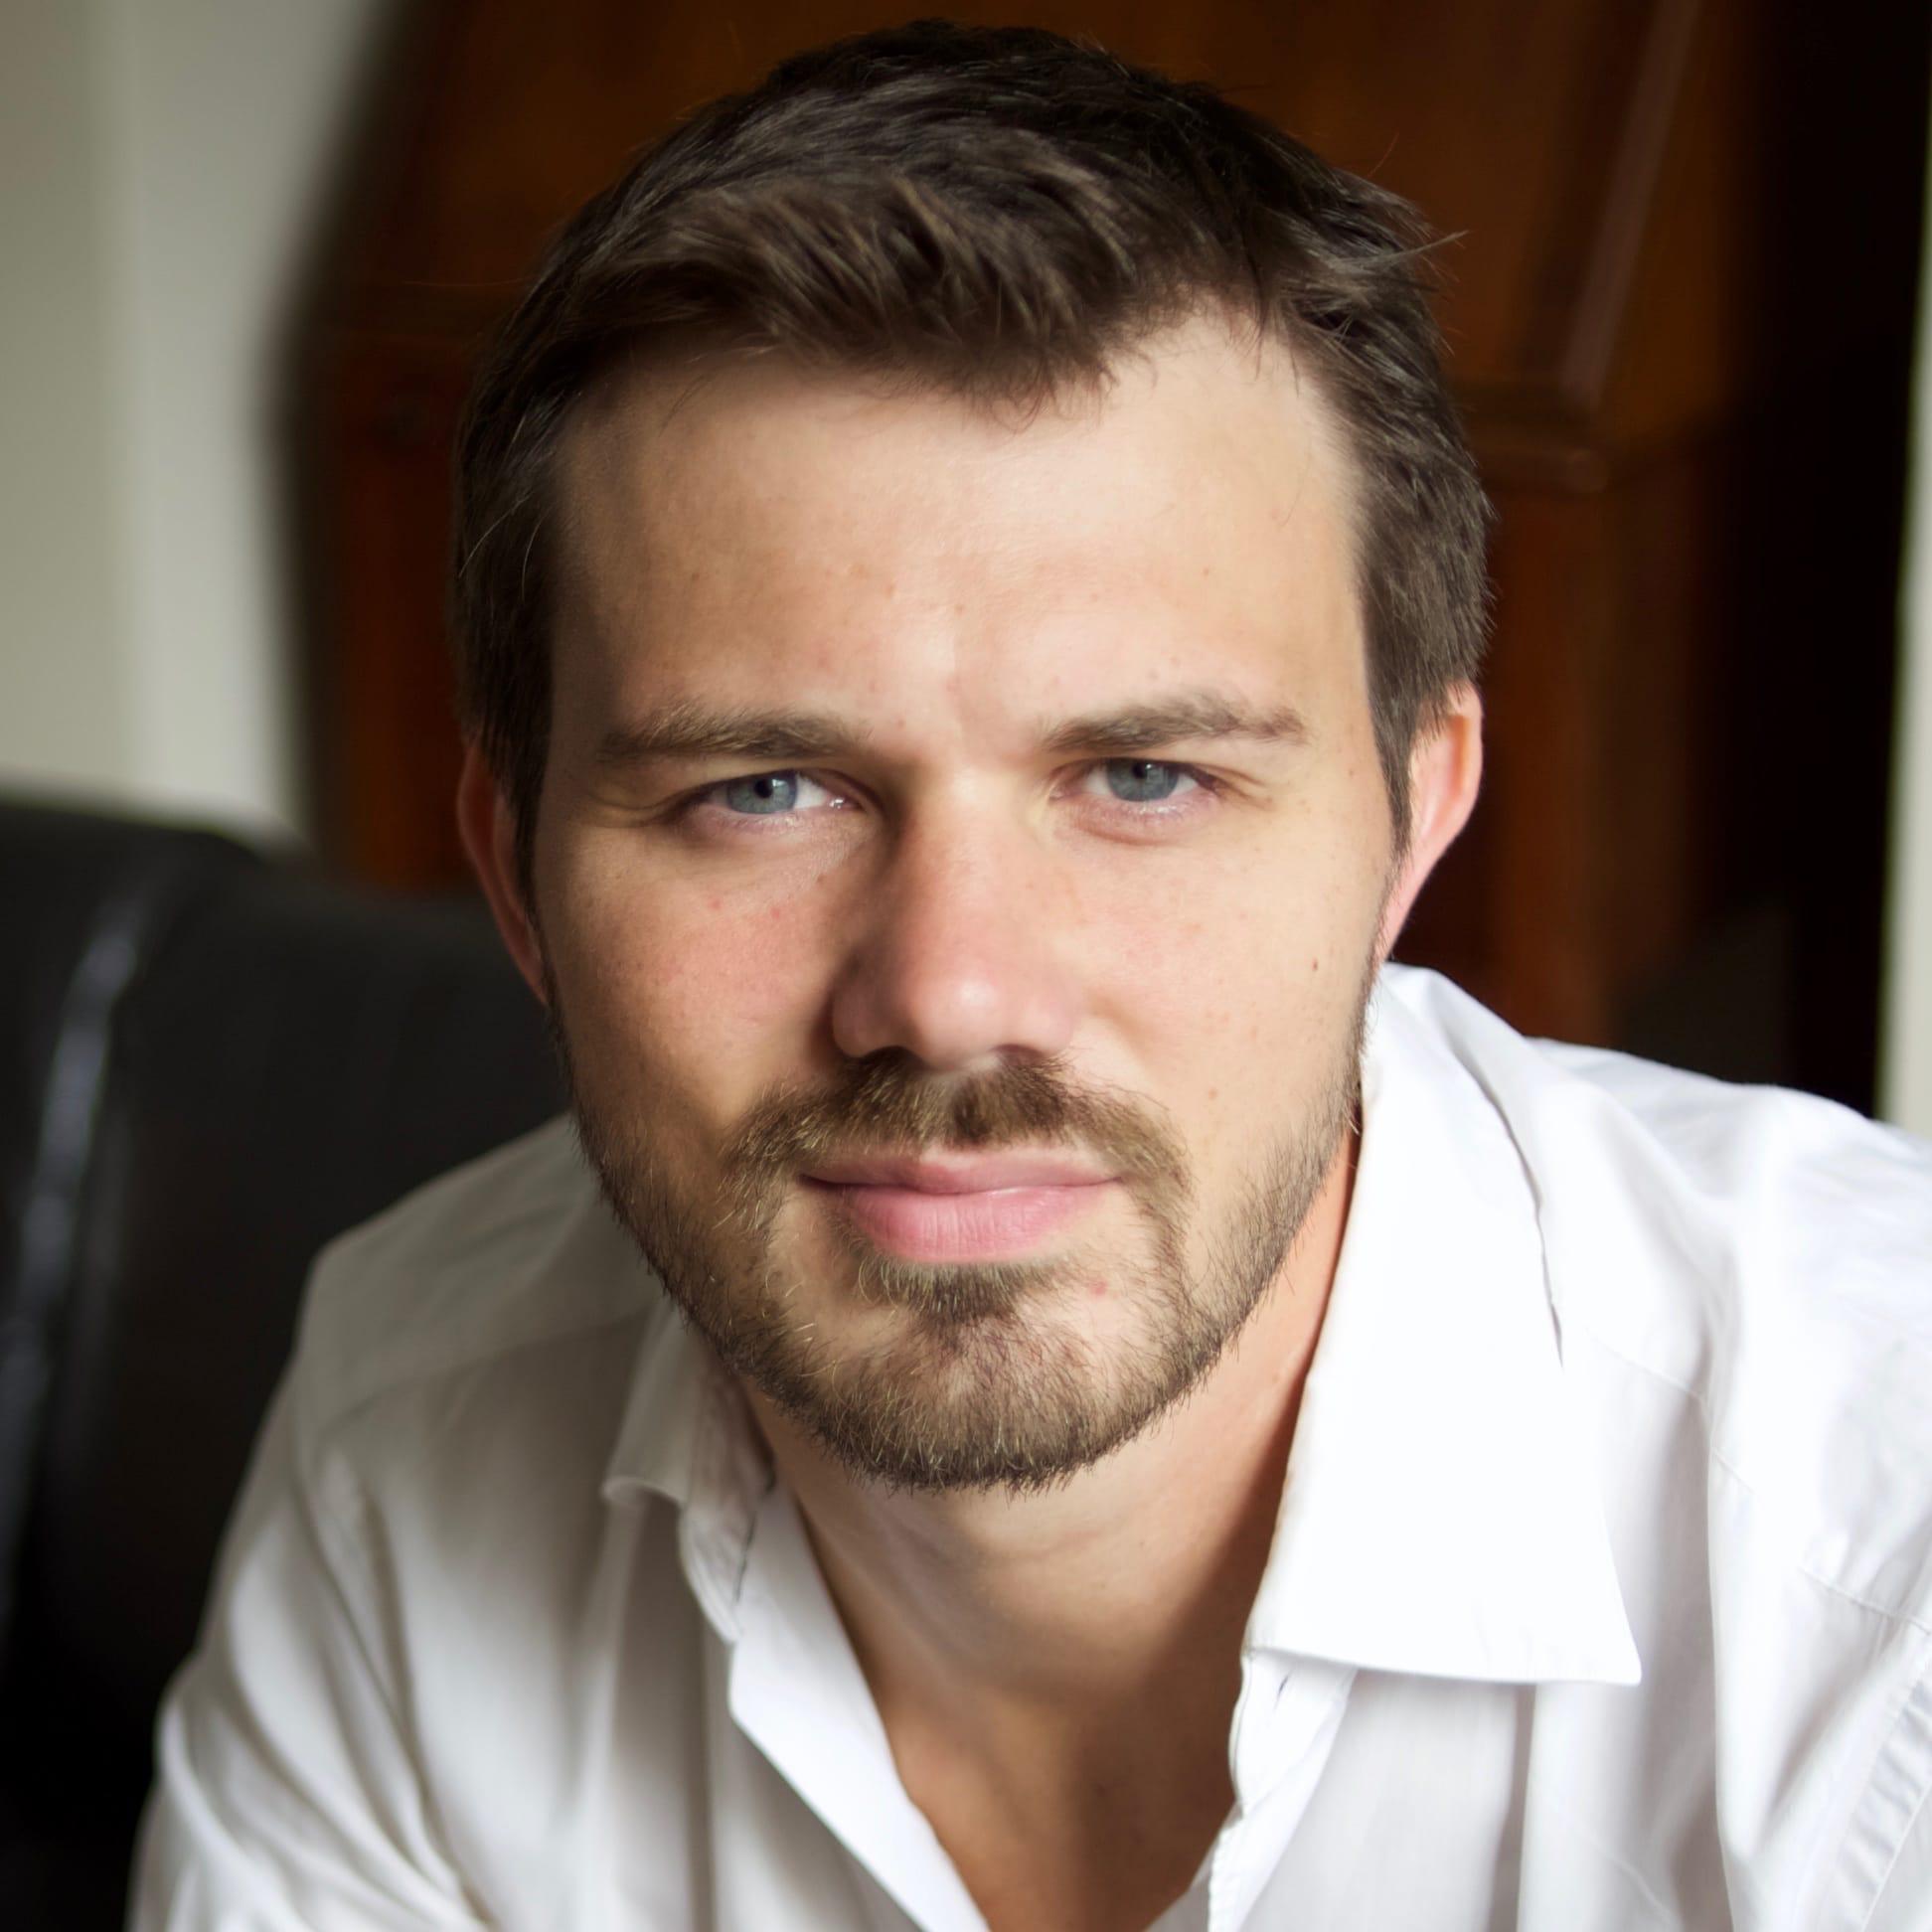 Scott-Gould-engagement-speaker-at-Great-British-Speakers